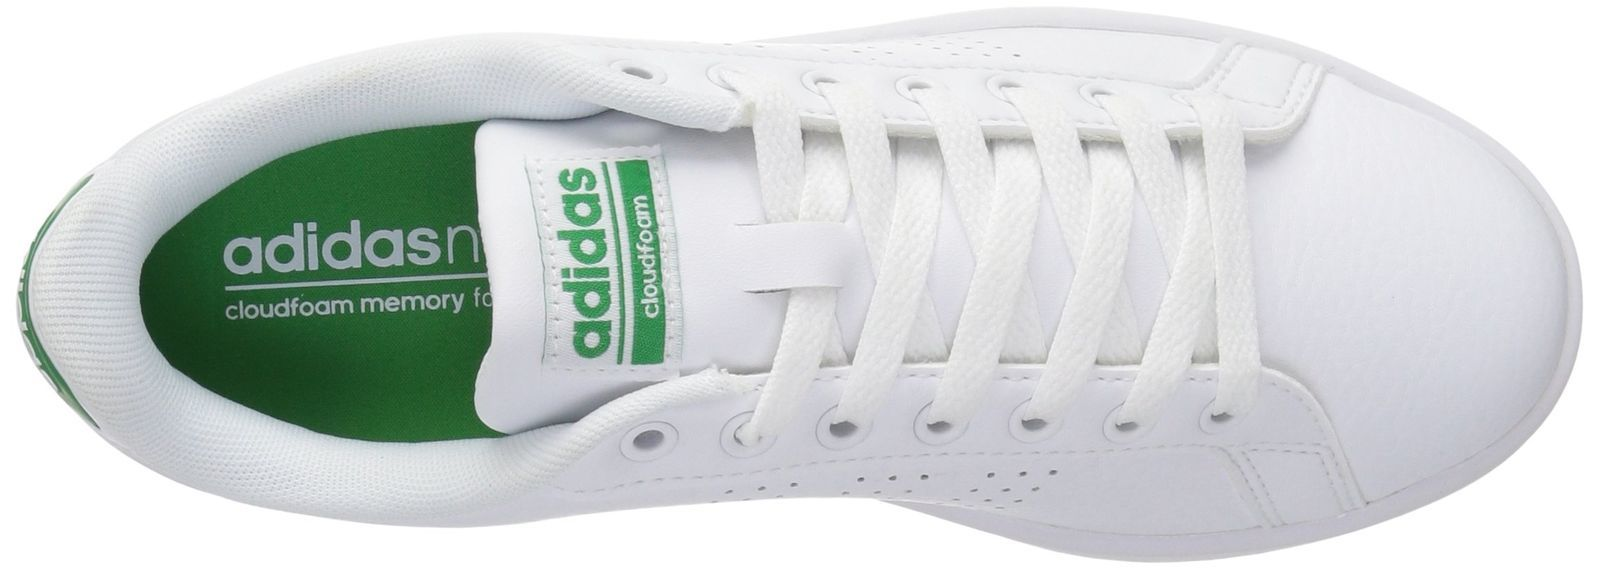 the latest 0302a 1f1a3 ADIDAS MEN S CLOUDFOAM ADVANTAGE CLEAN SNEAKER WHITE GREEN 10 ...